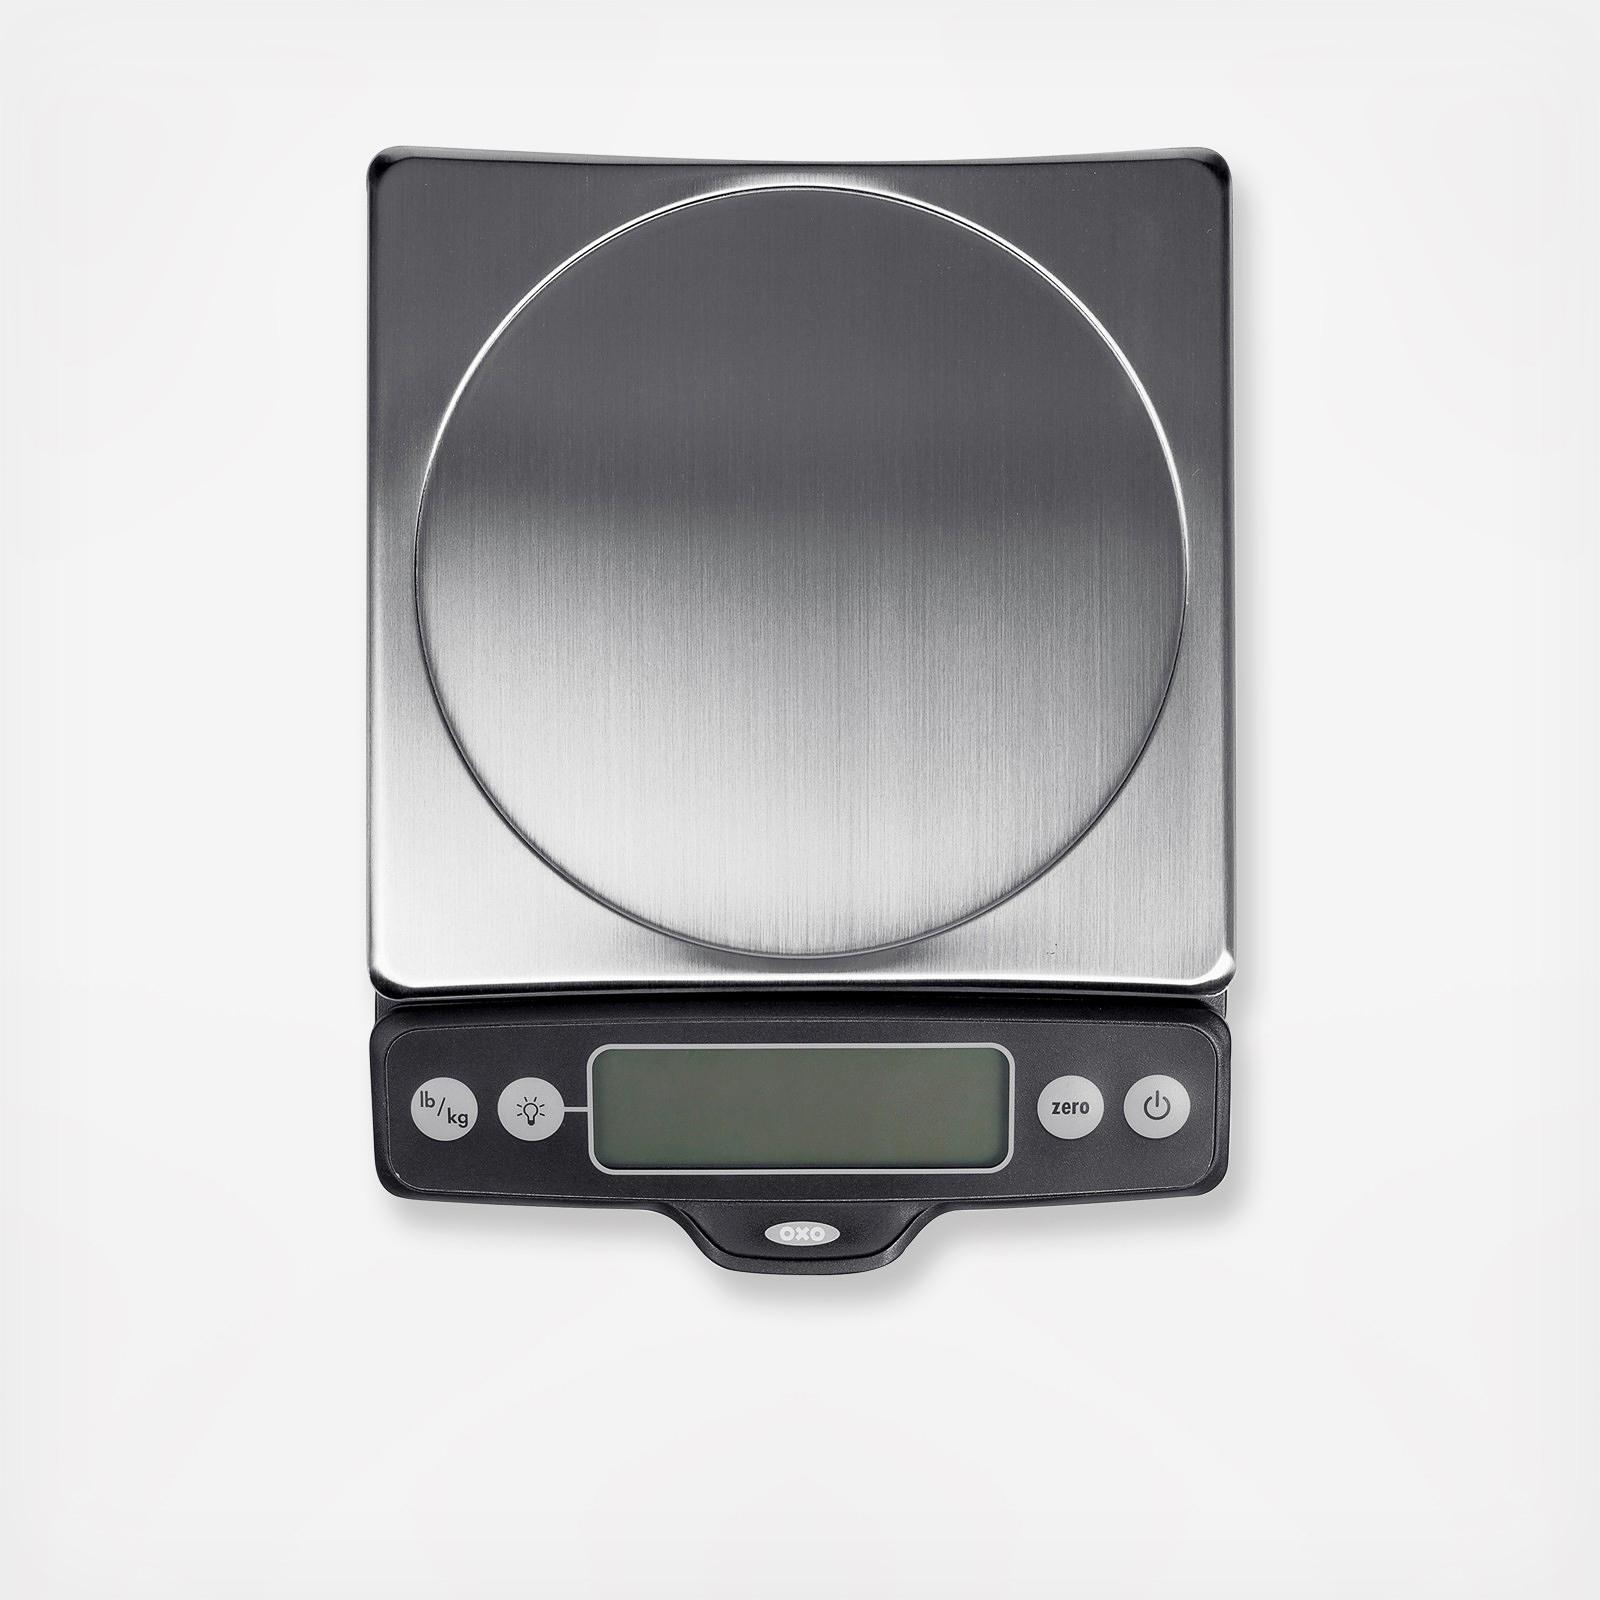 oxo digital food scale